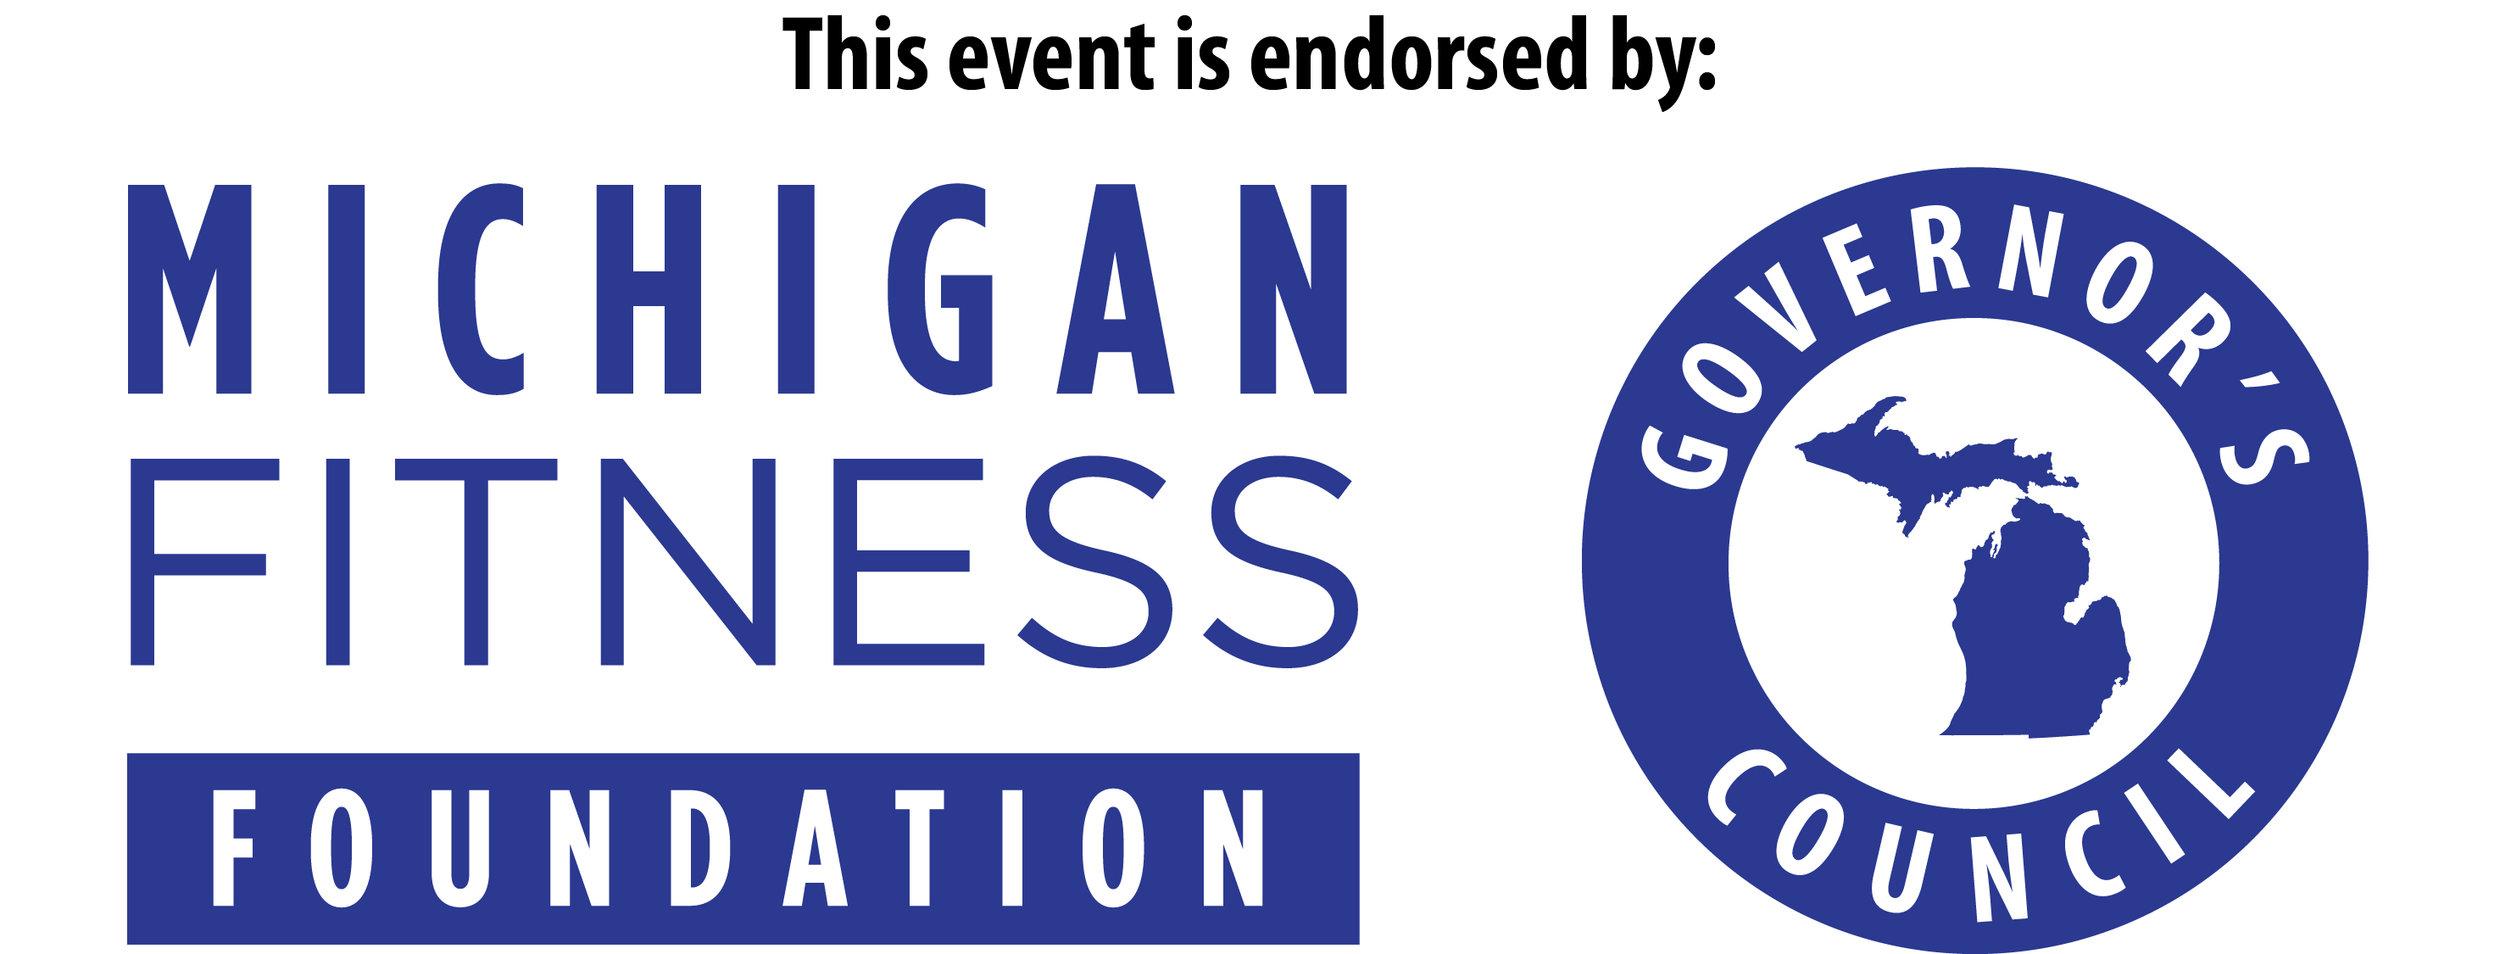 Endorsement Logo.jpeg